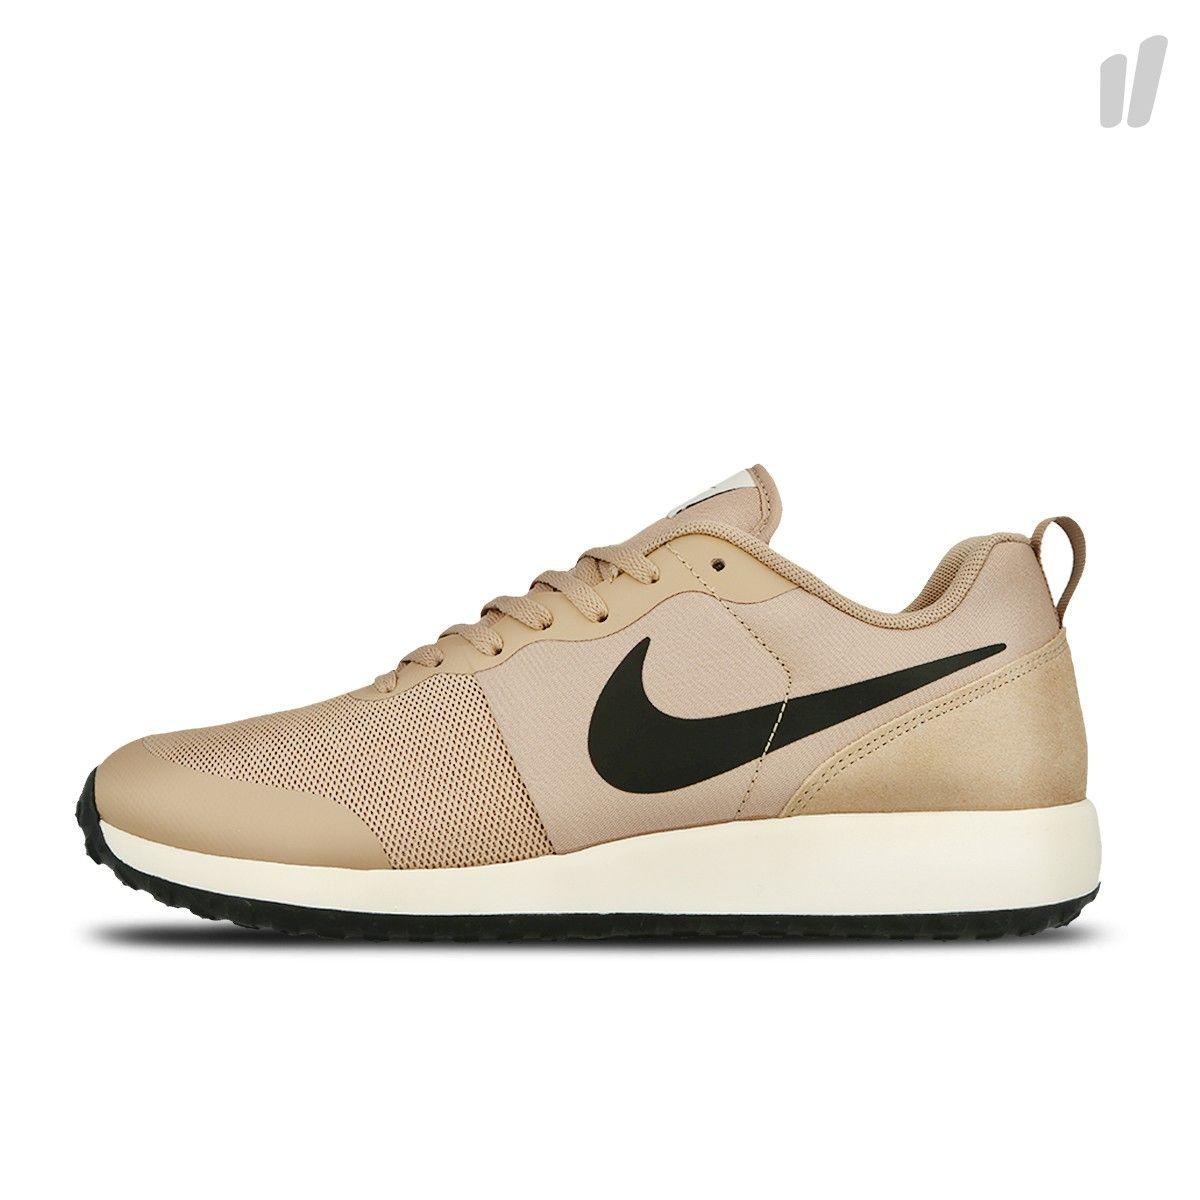 tener Cortar Falsedad  Nike Elite Shinsen Desert Grey April 2016 | Nike elite, Nike, Sneakers nike